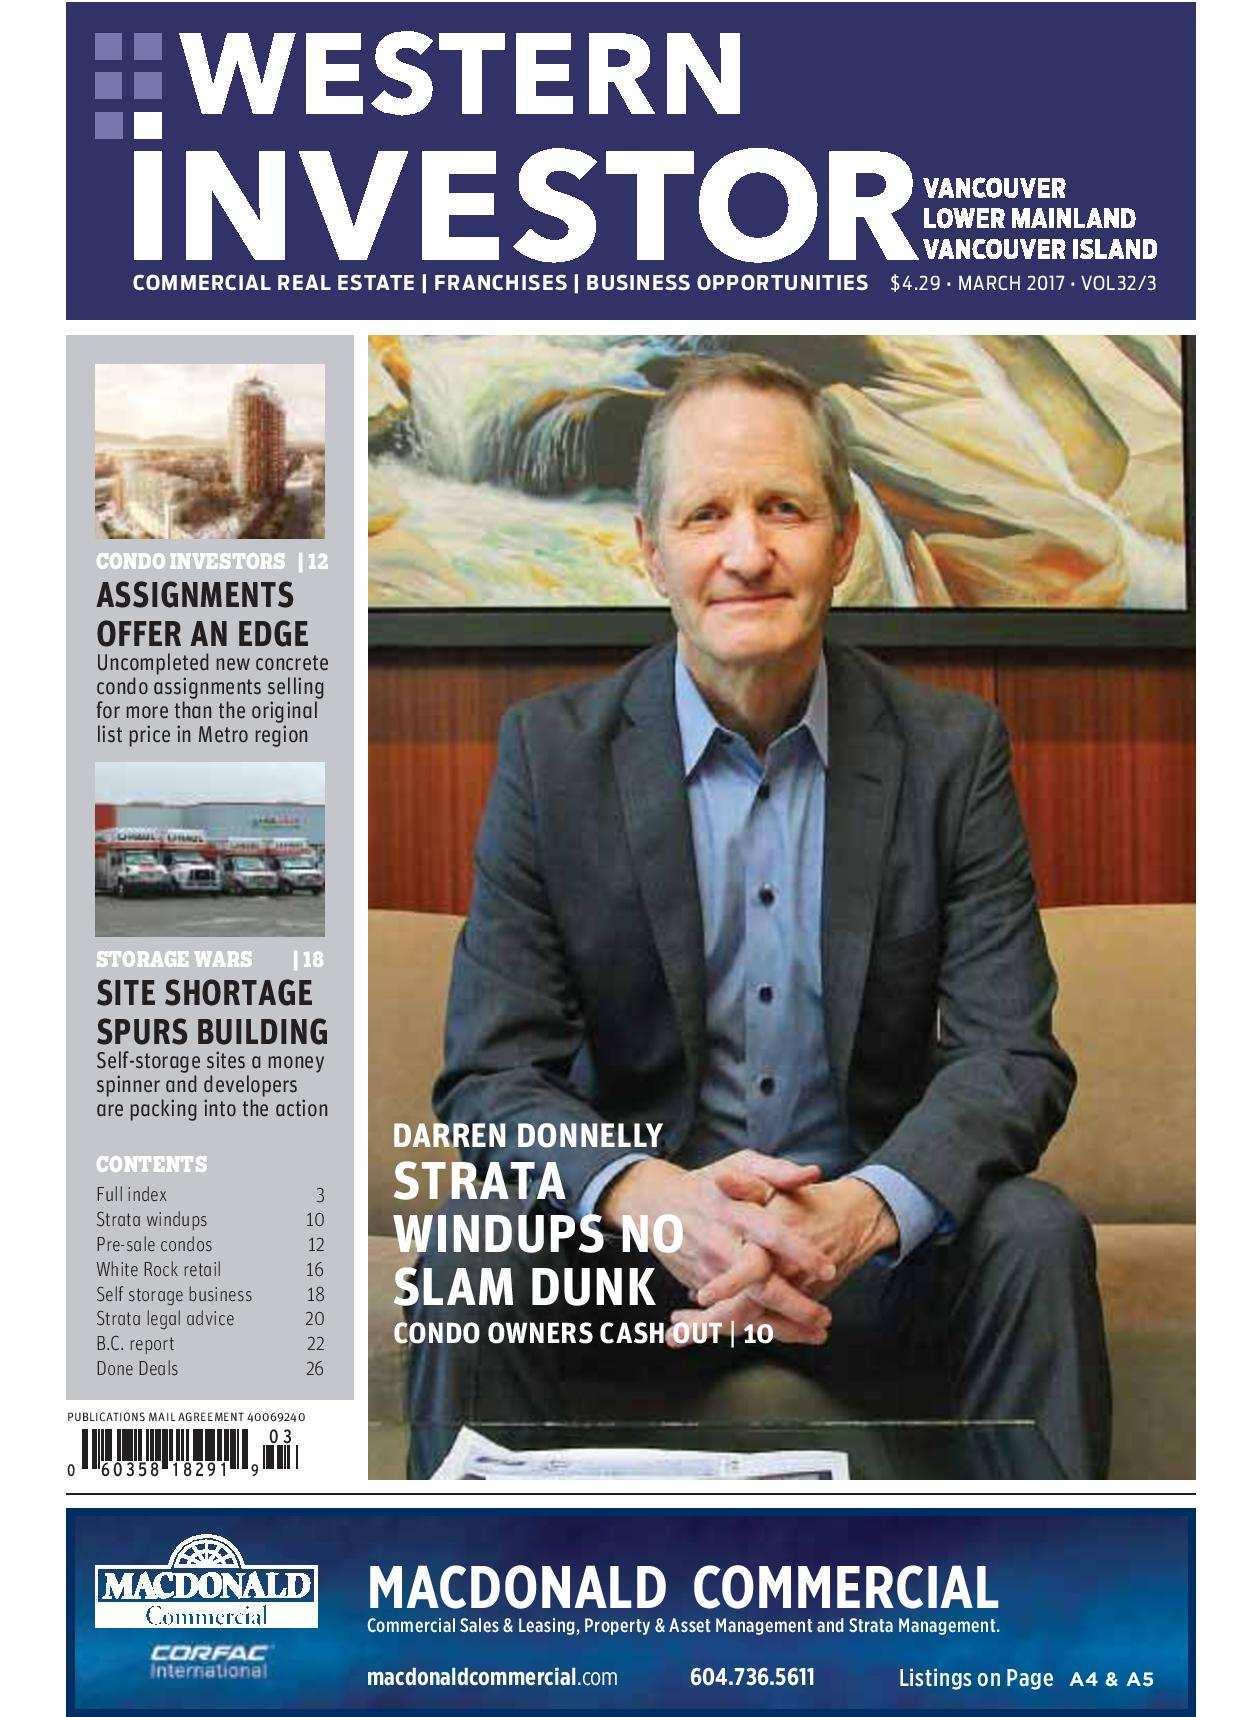 Press Release: Western Investor Ad – March 2017